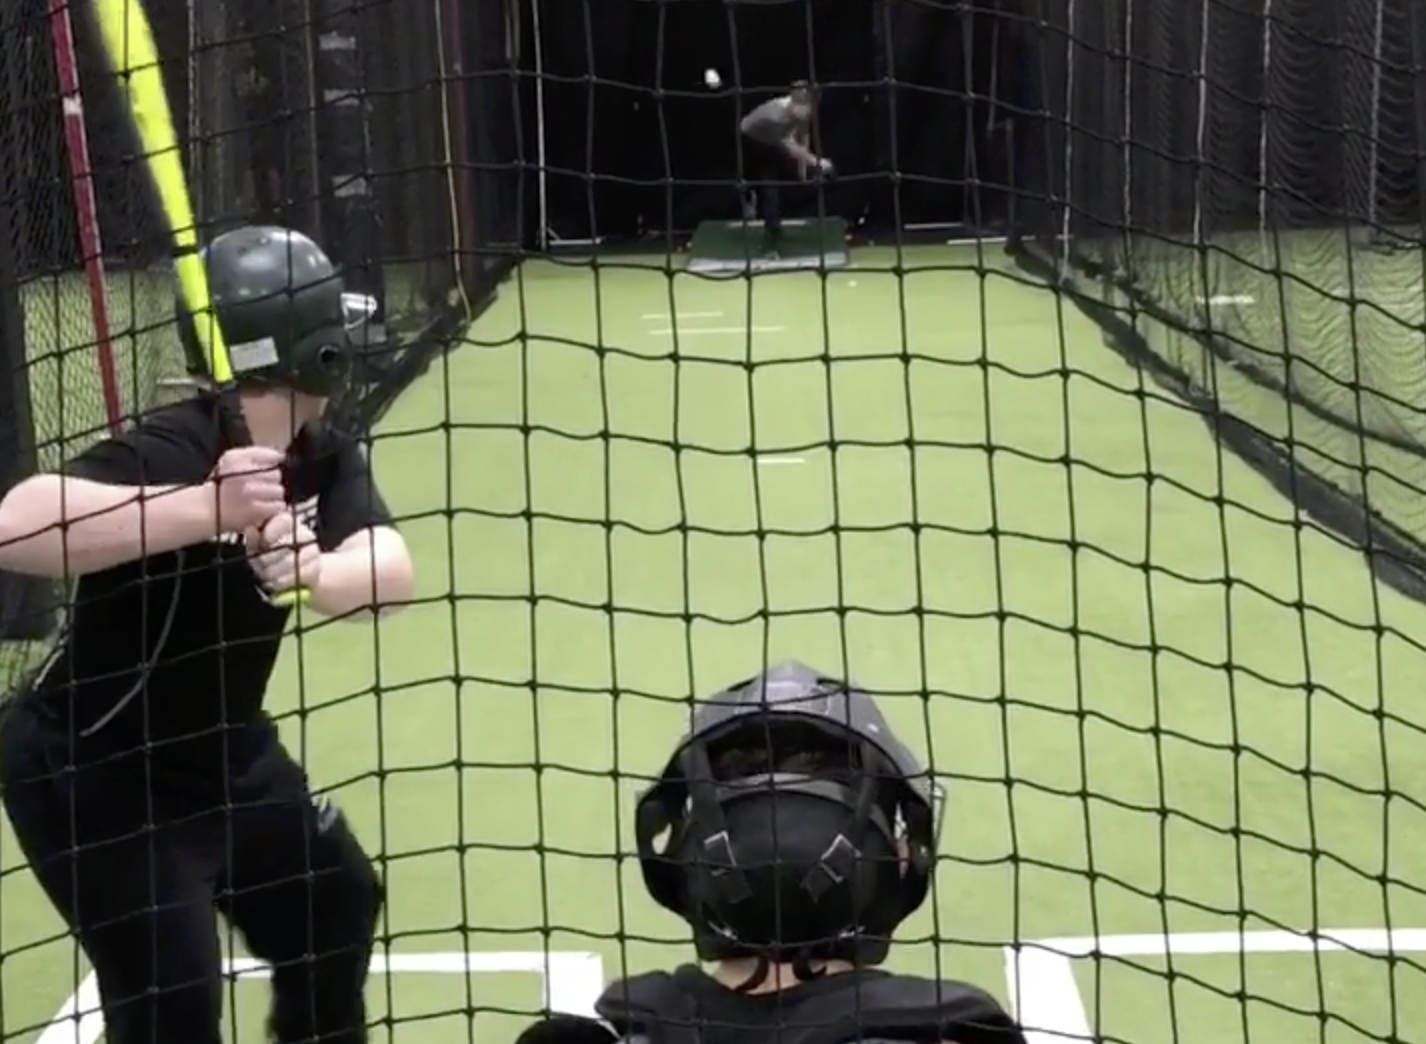 Pre-eten ready to swing in batting cage